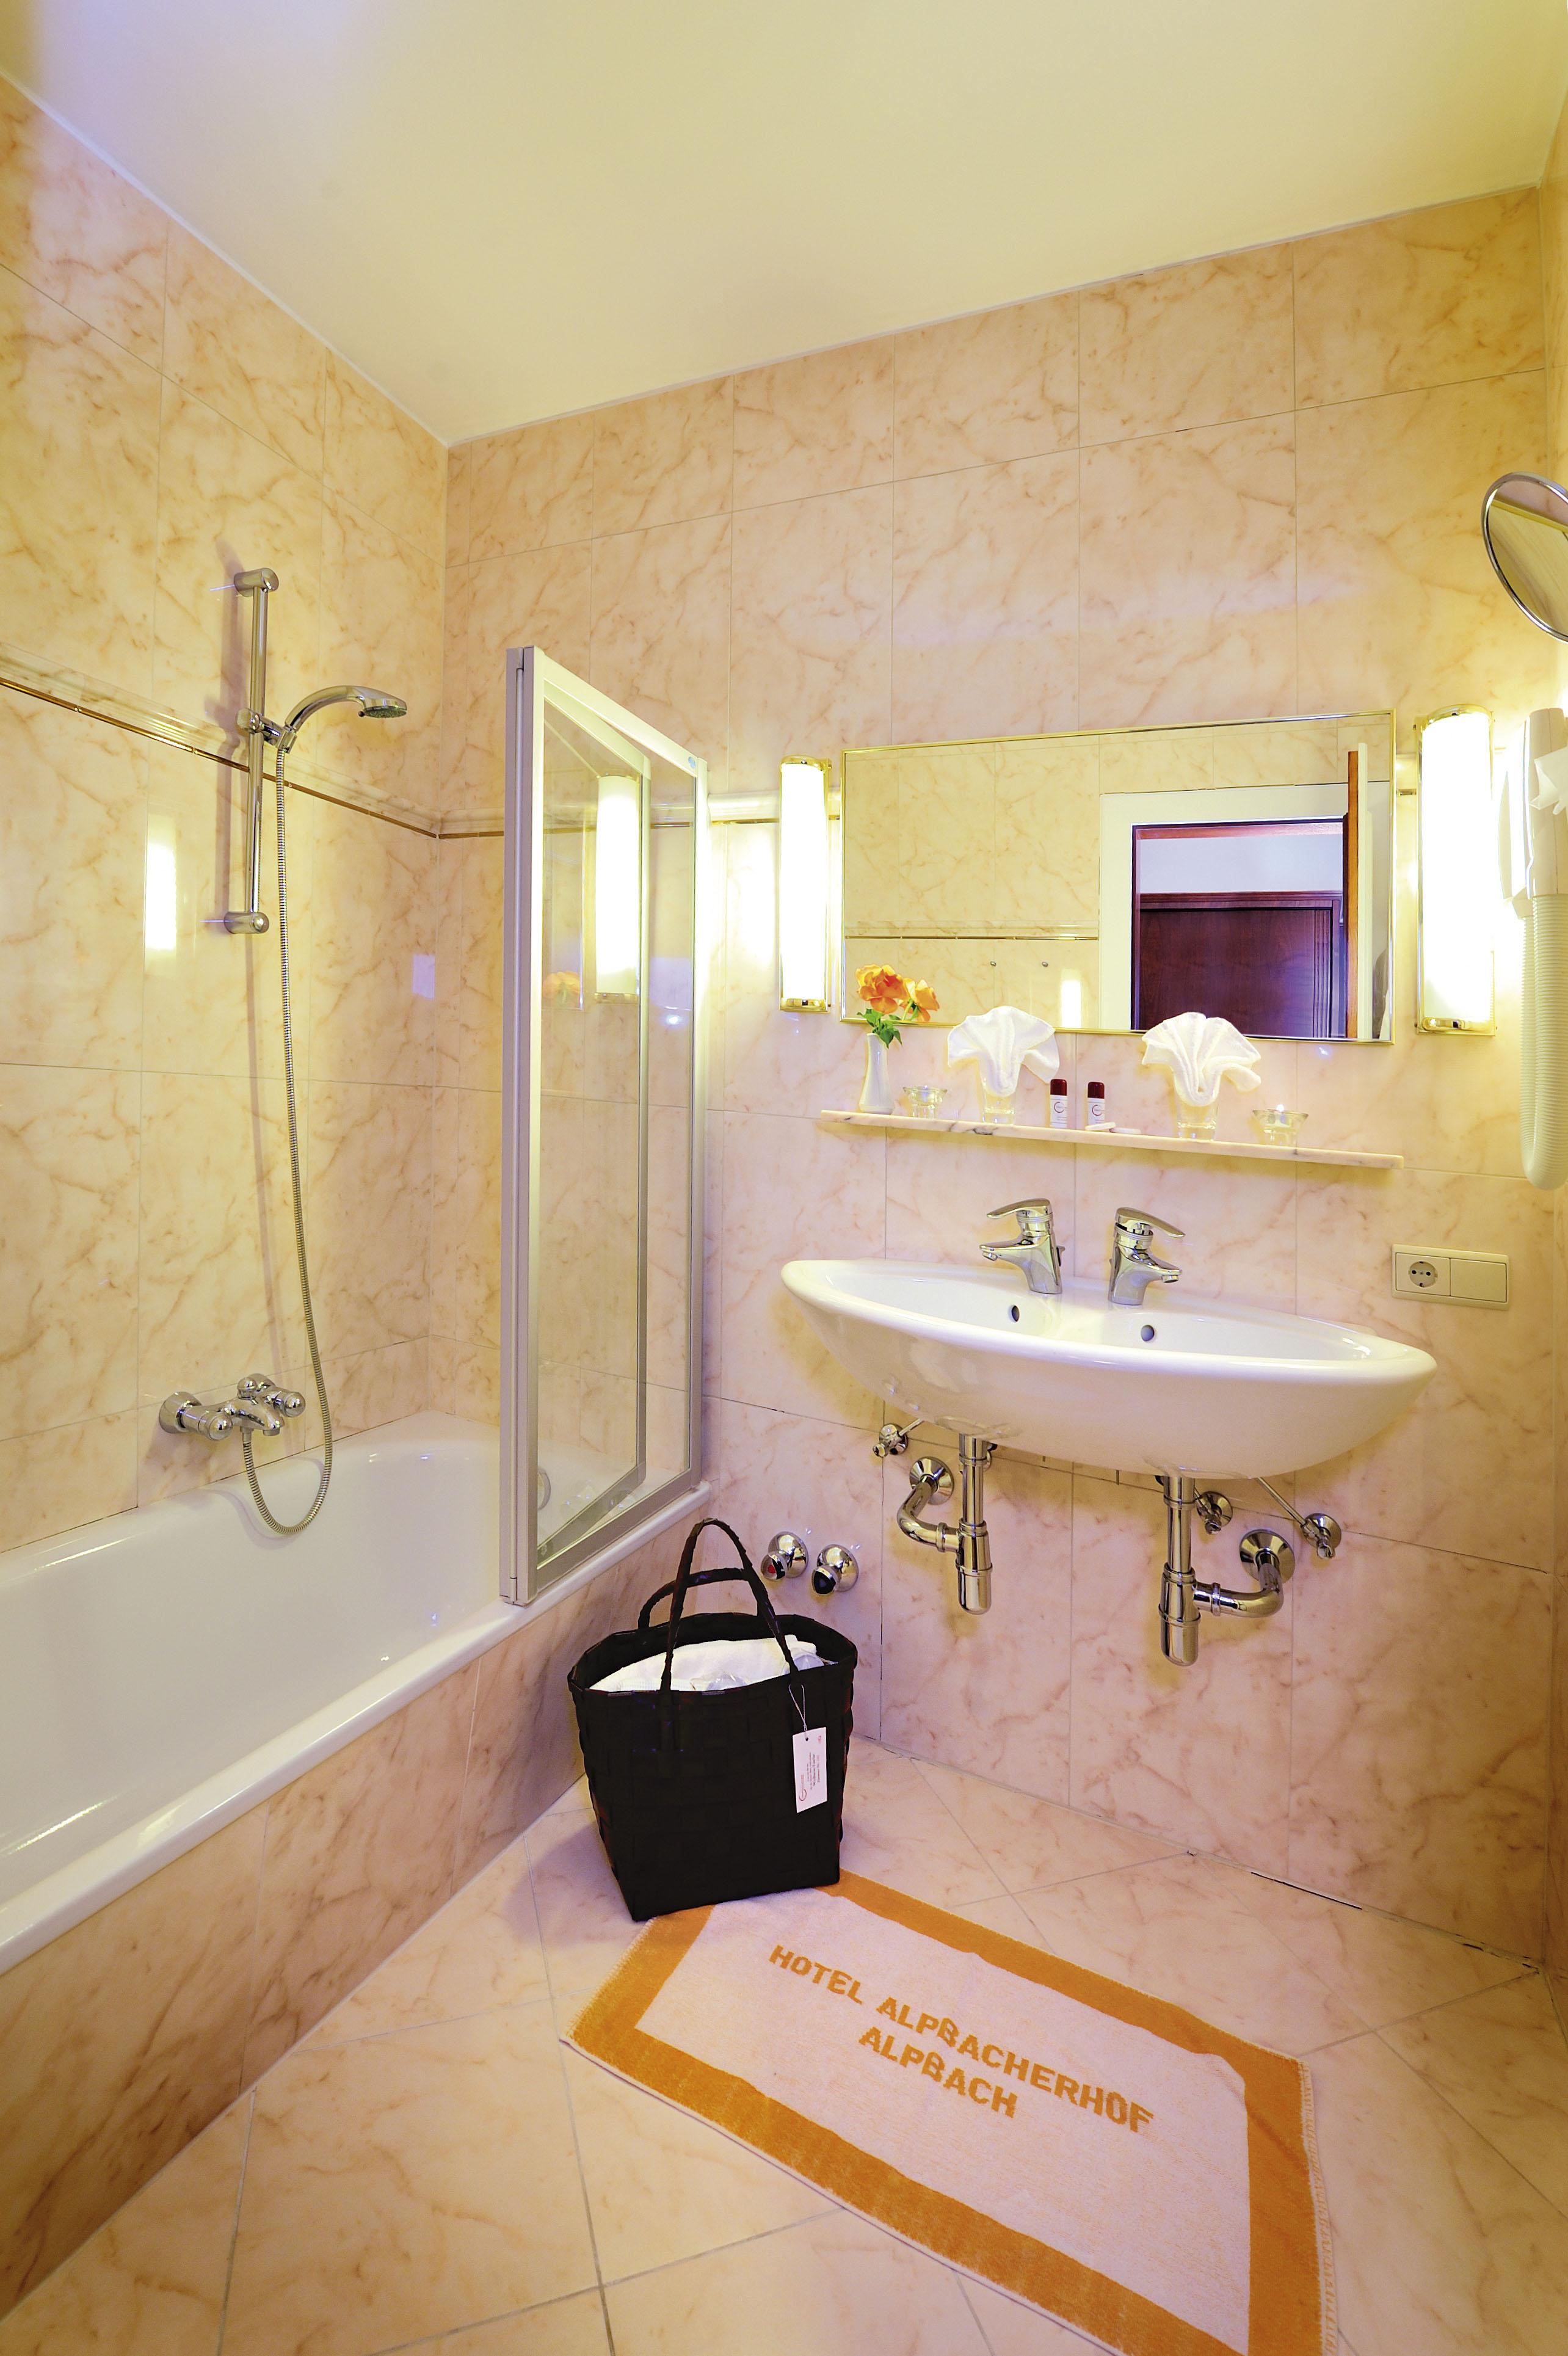 Wohnkomfortzimmer Klassik Bad im Wellnesshotel Alpbacherhof in Tirol